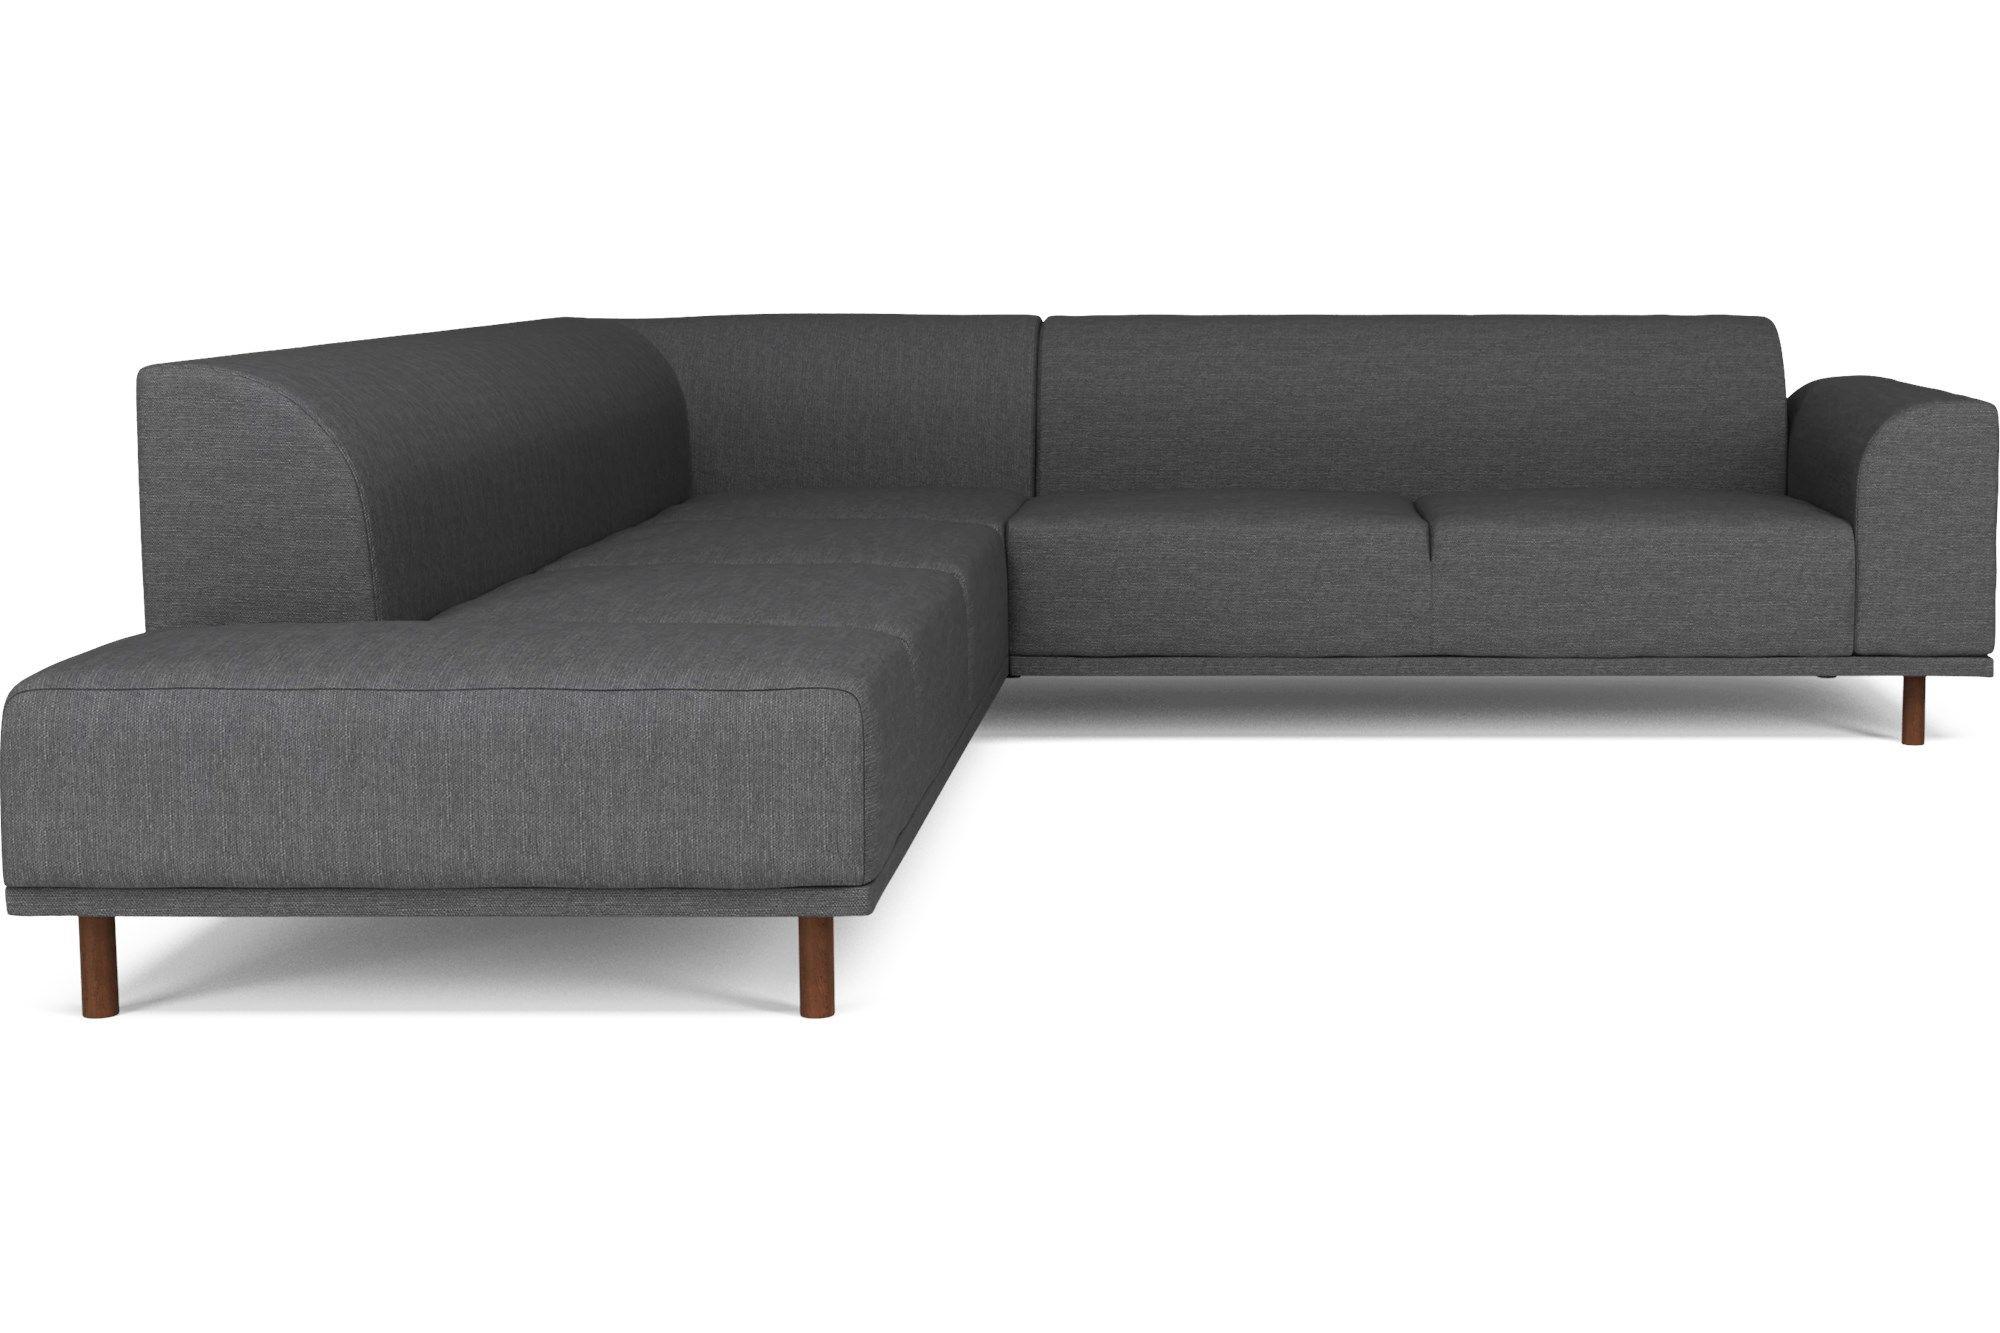 Hannah 7 pers ecksofa mit open end links ferienhaus sofa scandinavian design und link - Ecksofa skandinavisches design ...